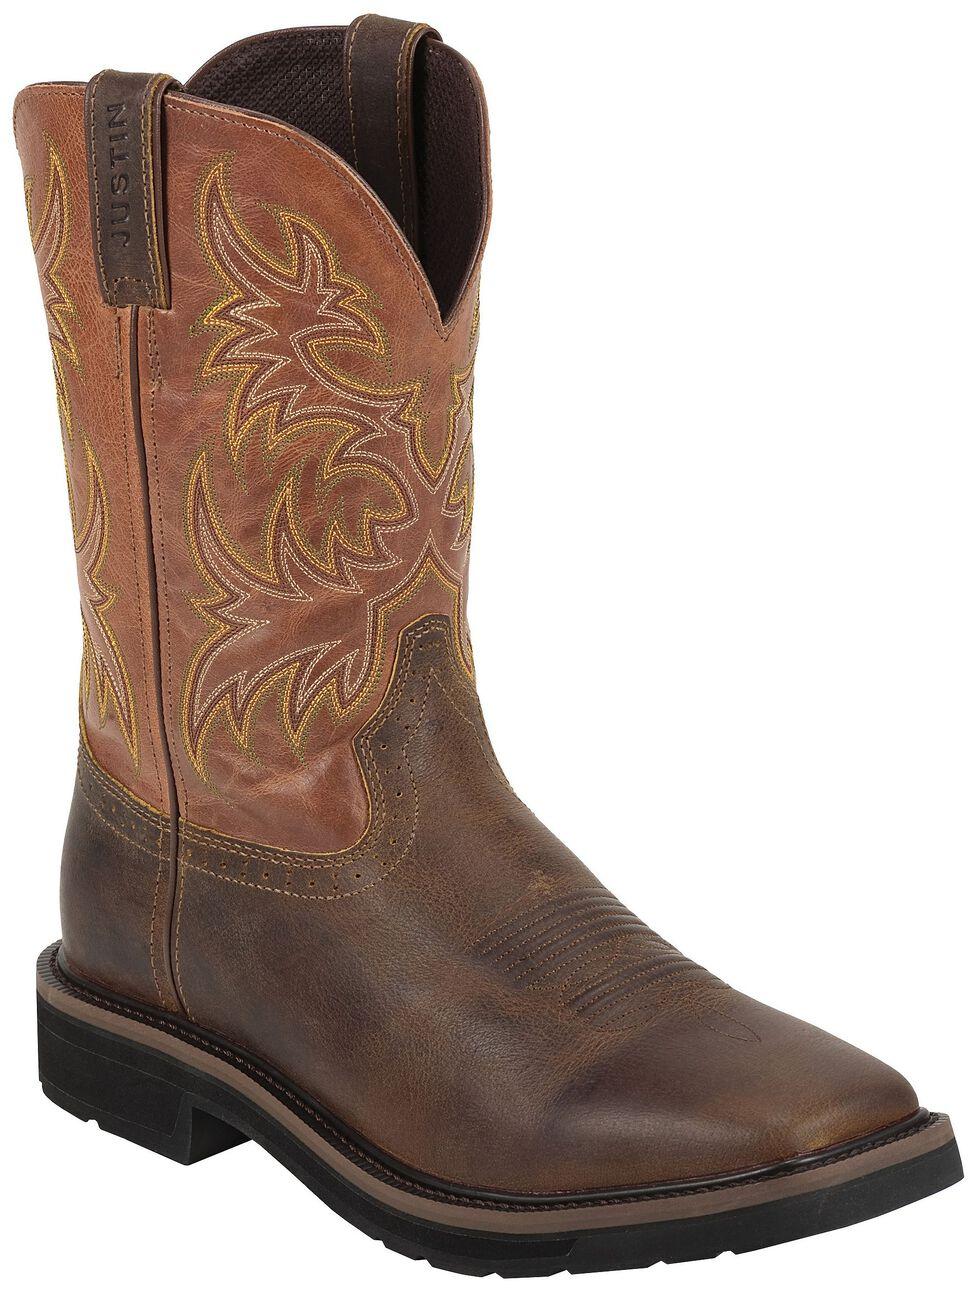 Justin Men's Stampede Switch Work Boots - Soft Toe, Tan, hi-res